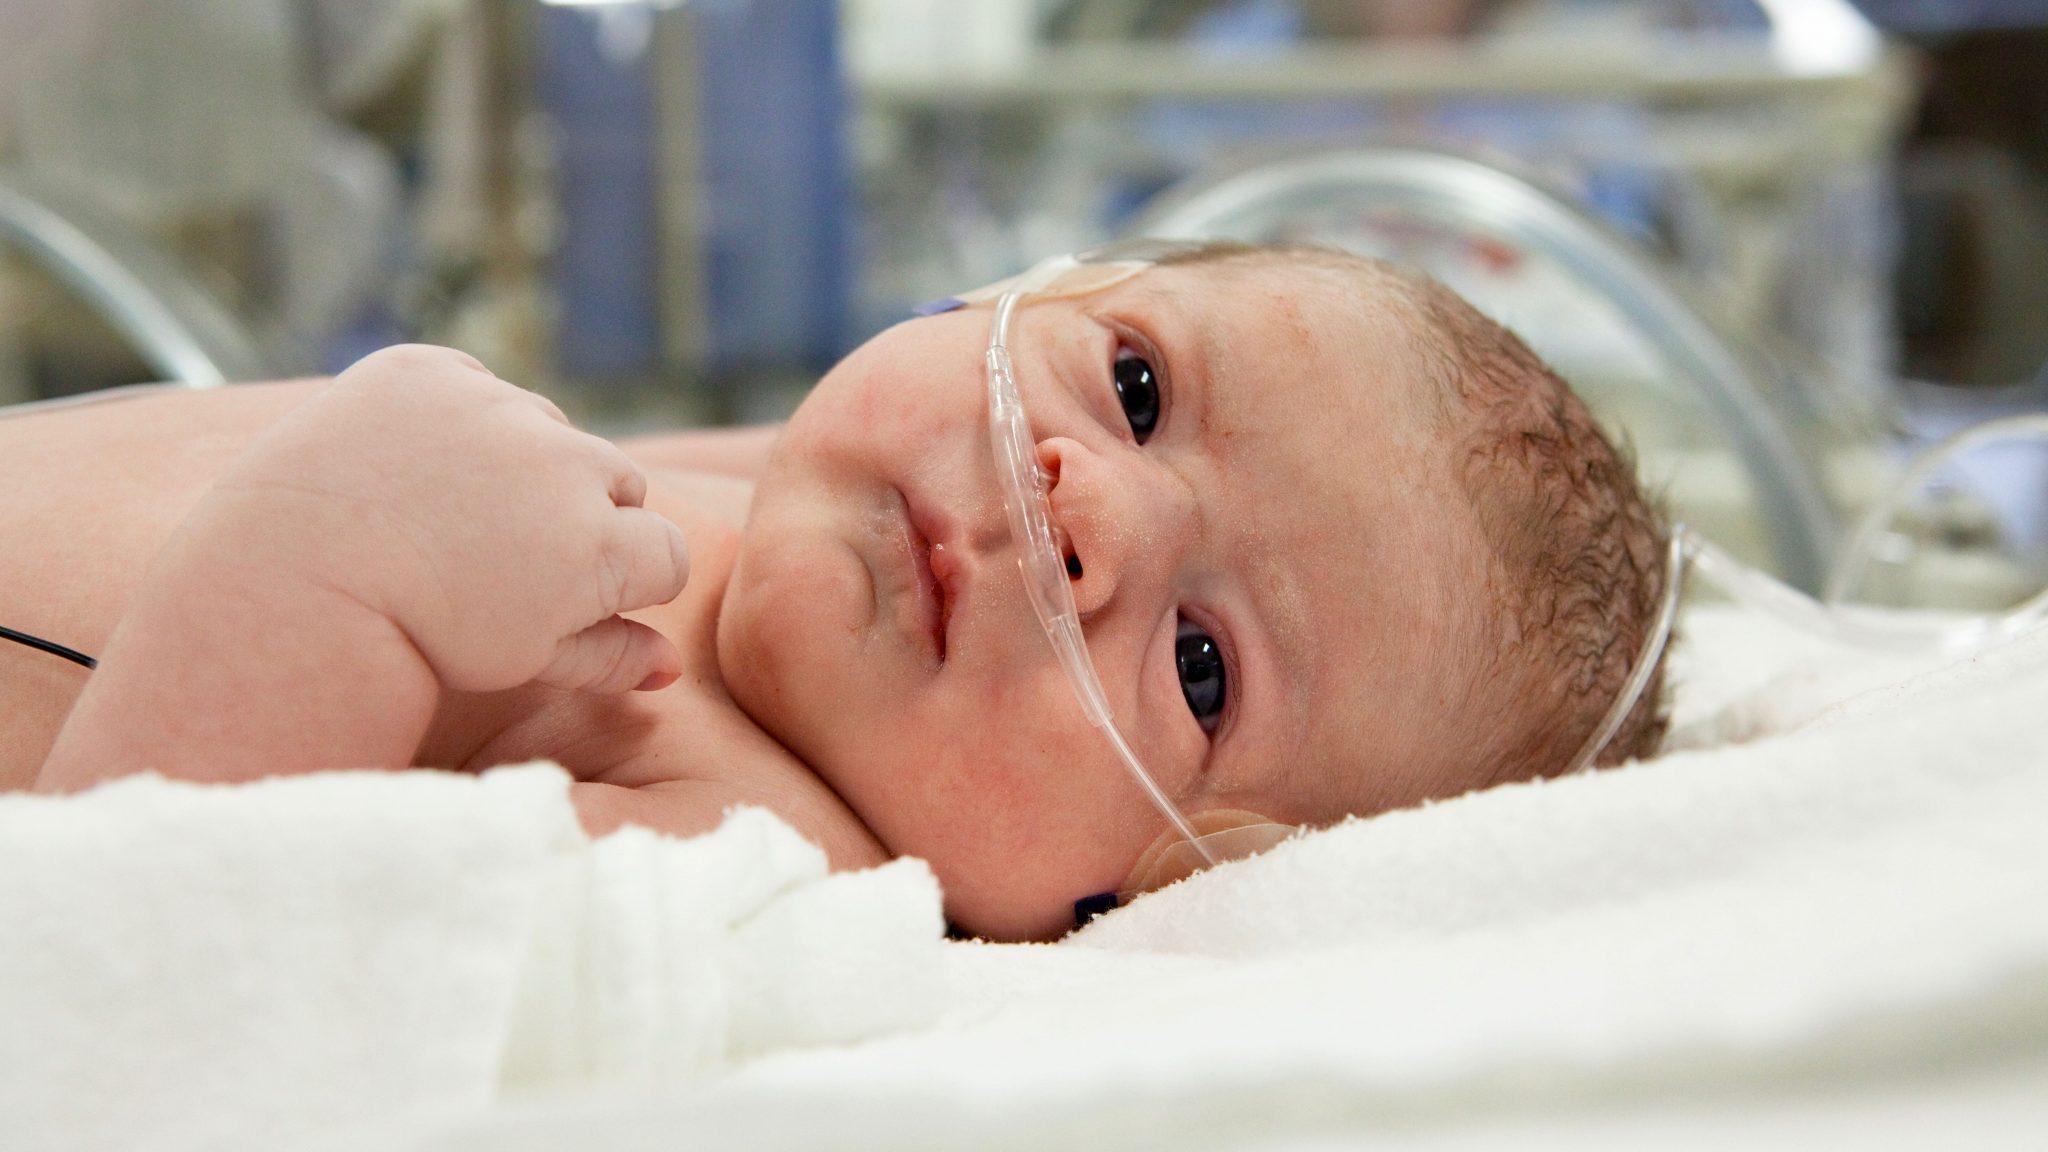 Newborn on oxygen